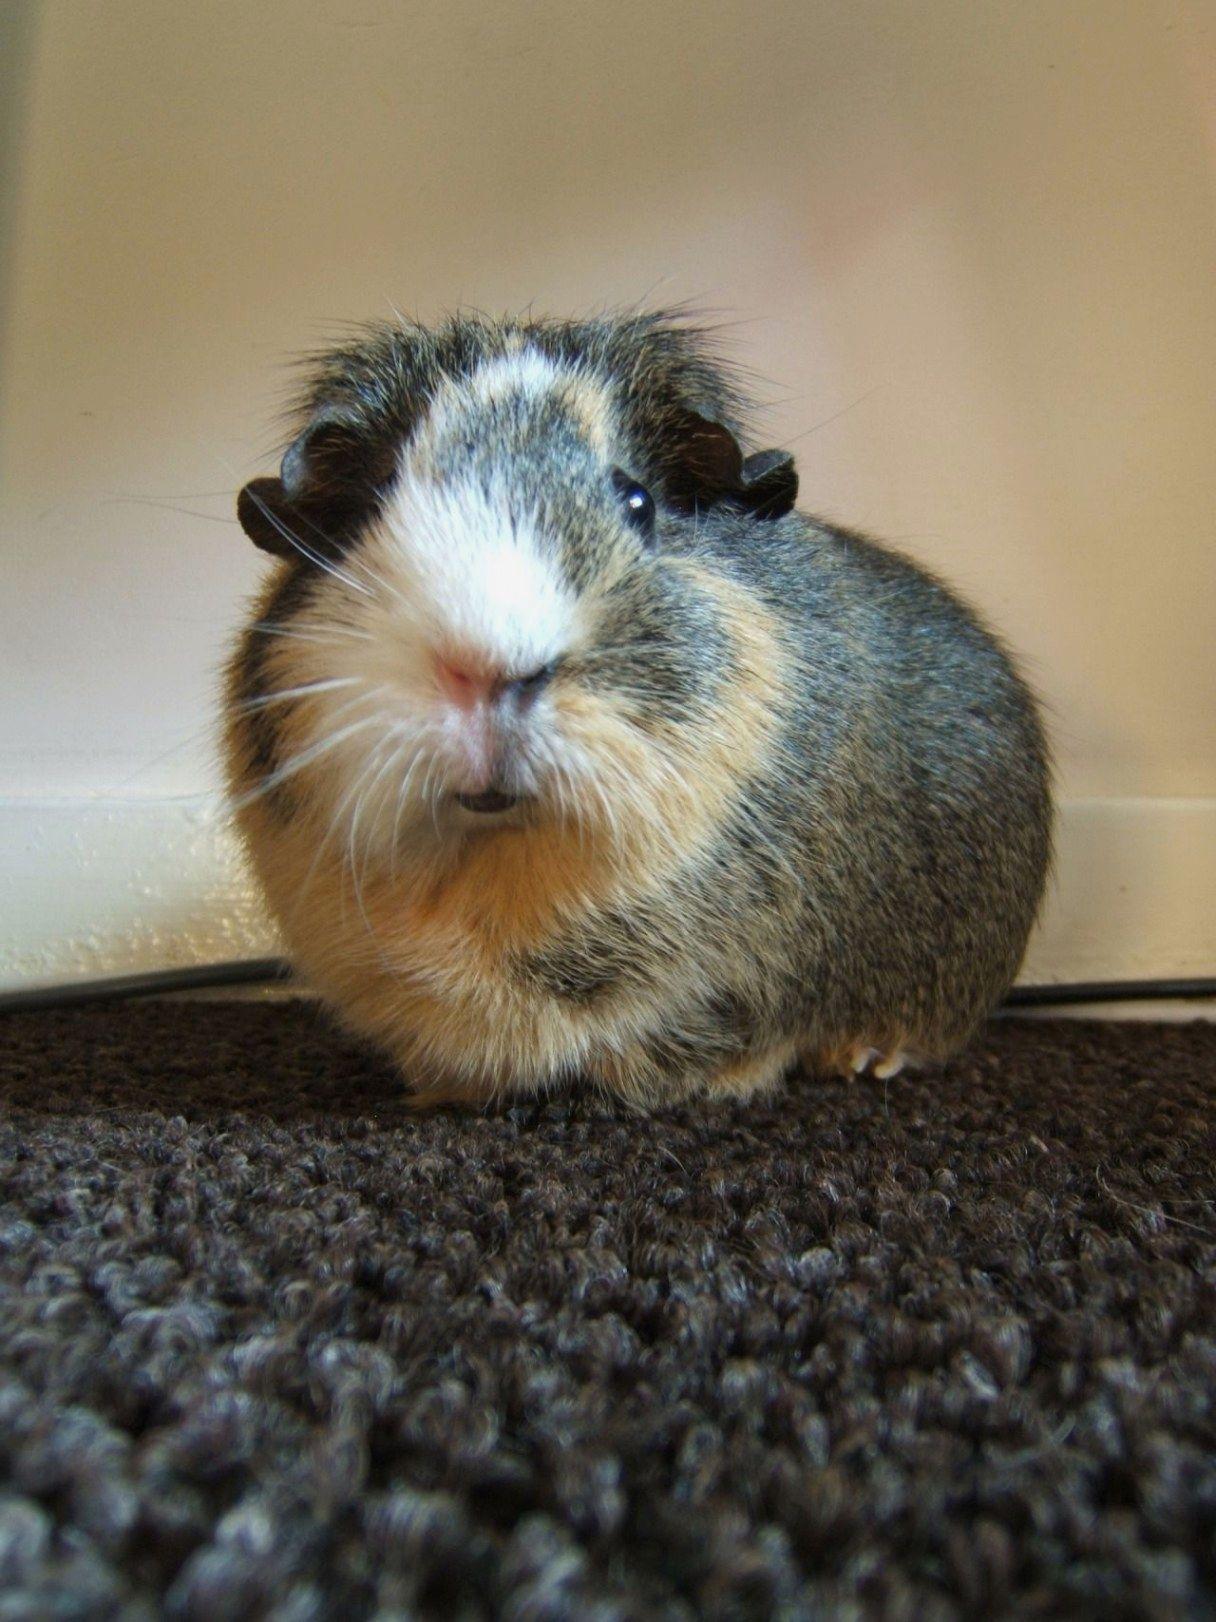 Contented piggy guineapiggy (mit Bildern